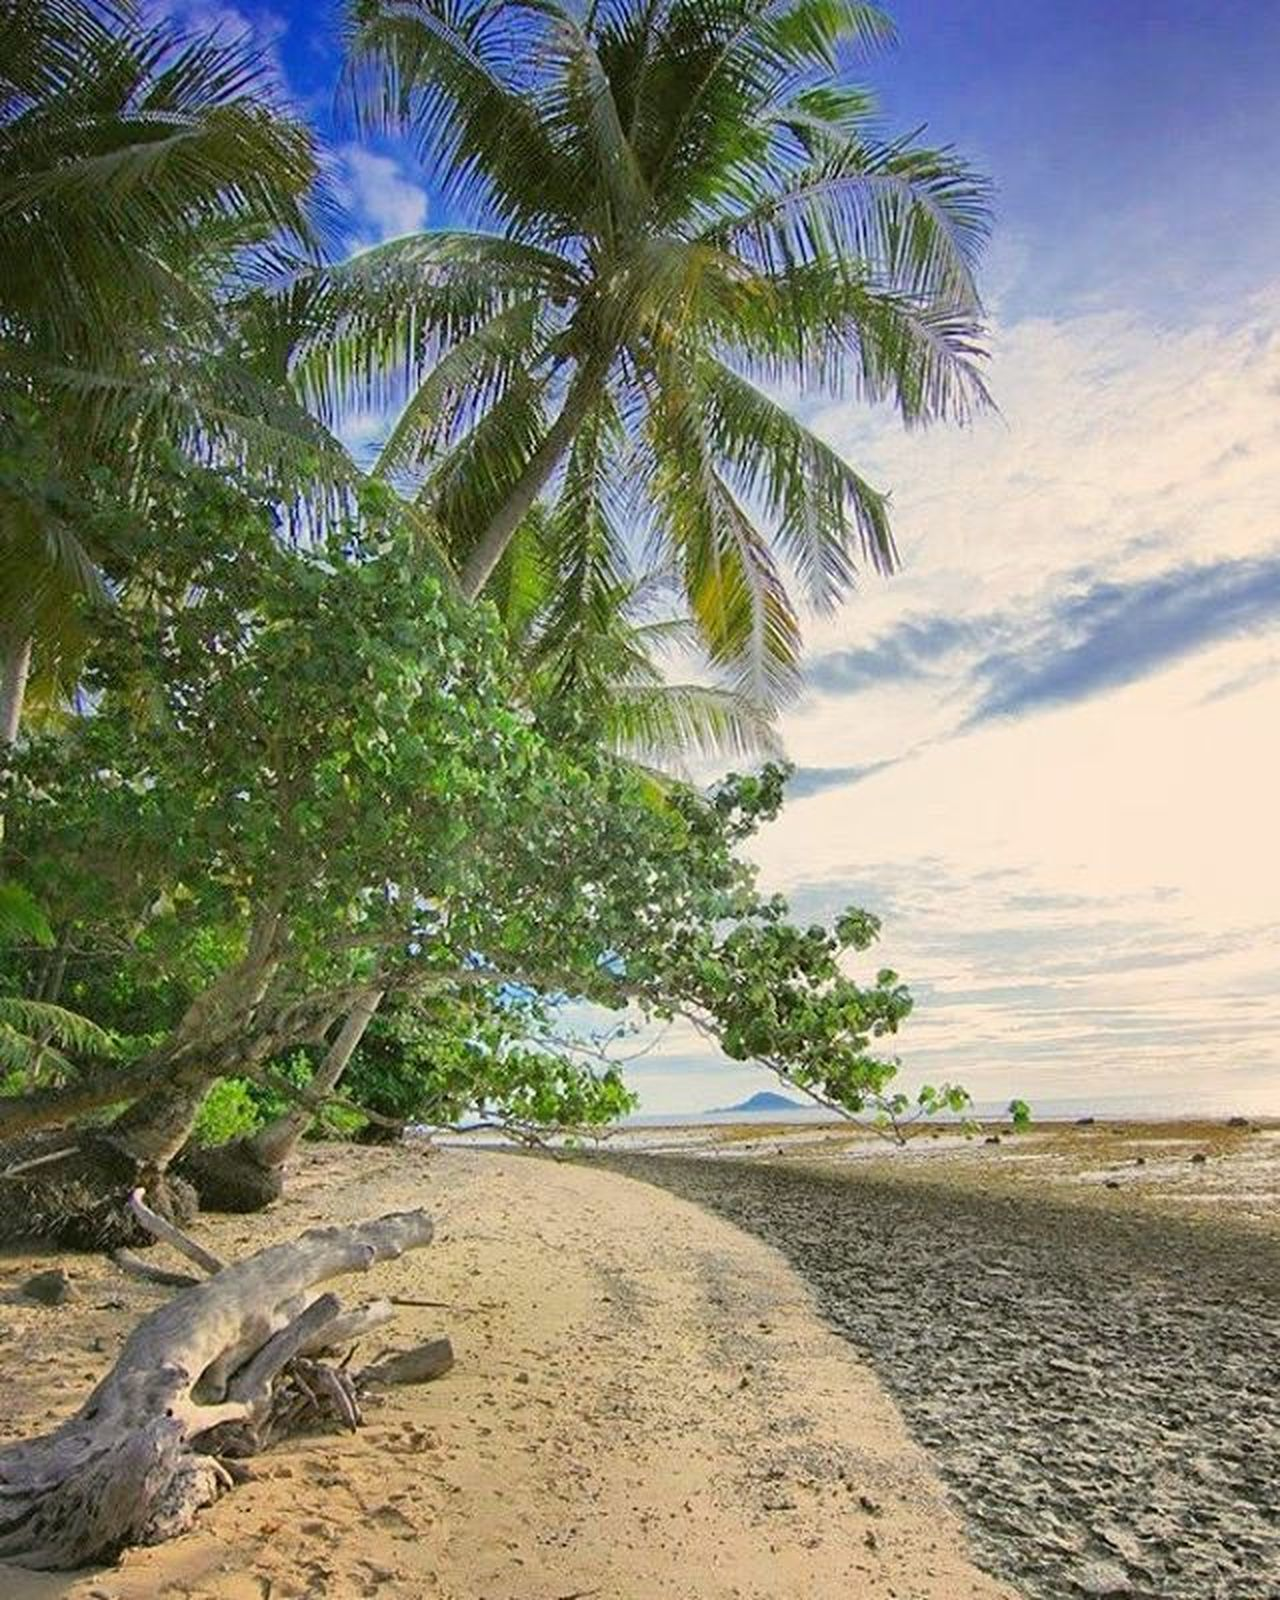 Kesepian dalam keindahan bukan berarti dalam posisi terpuruk... Semua membutuhkan proses dan waktu untuk penyesuaian... . Location : Pulau Cingkuak, Painan . . . Exploresumatra ExploreSumatraBarat ExploreSumbar Adventuresumbar Potretsumbar Okesumbar Sumbar_oke Sumbar_rancak ExploreMinang Minangrancak Pesisirselatan